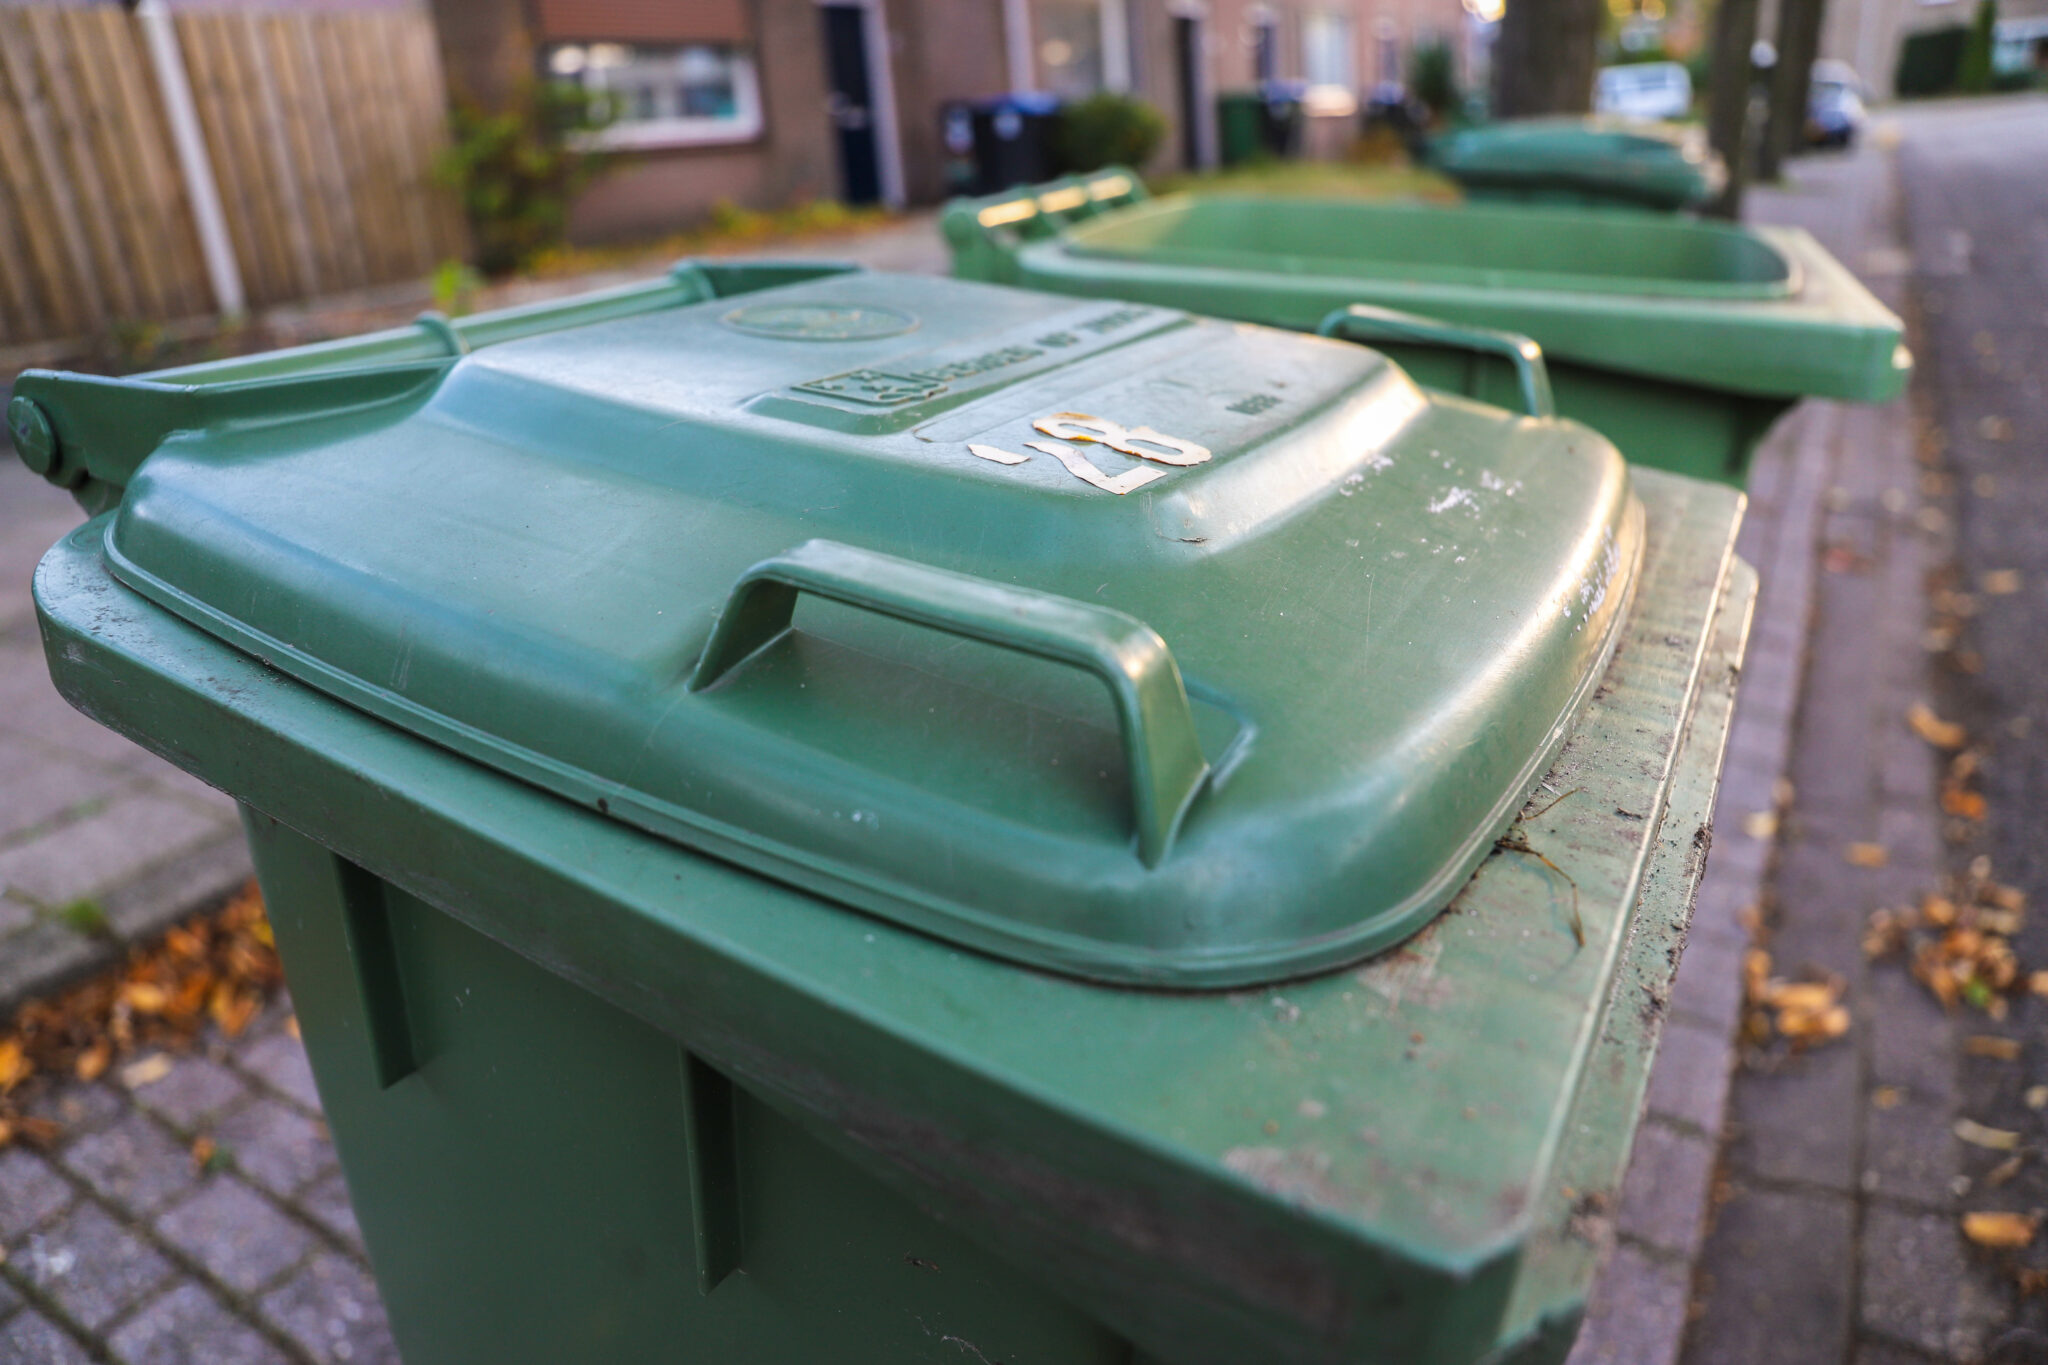 afval container groene prullenbak